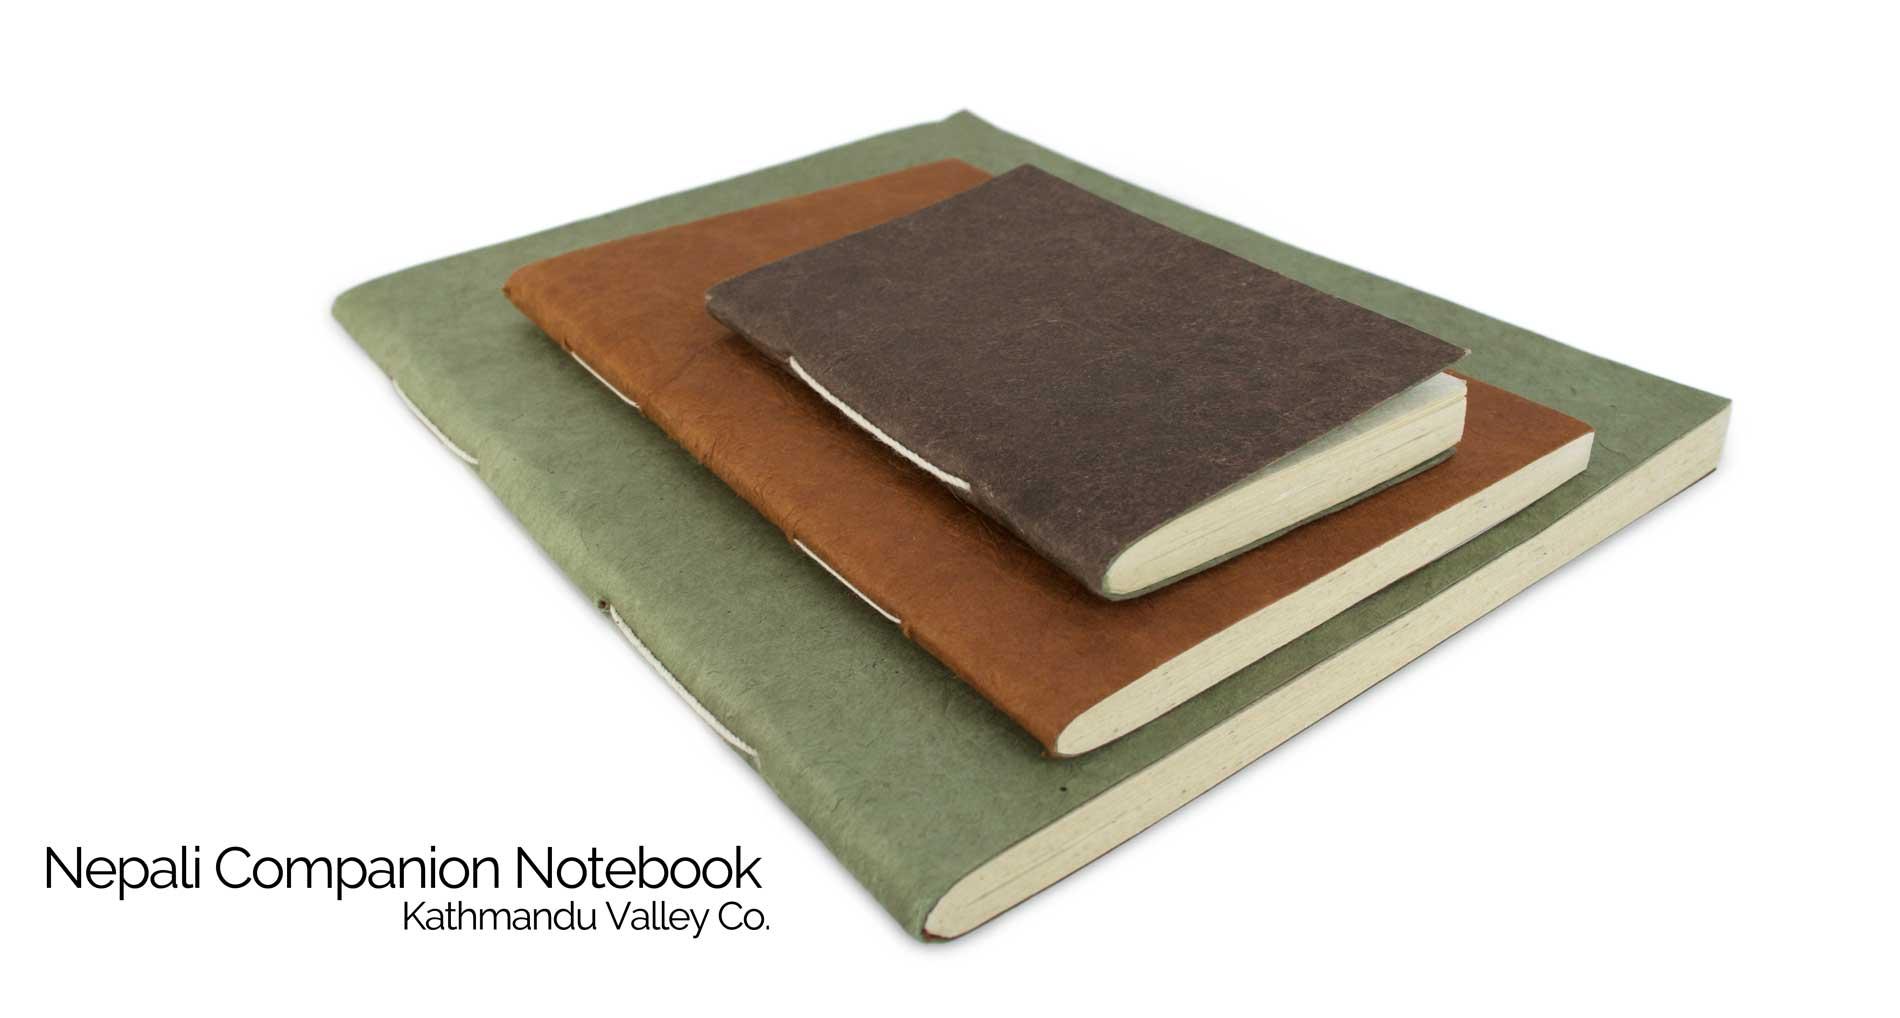 Nepali Companion Notebook Kathmandu Valley Co